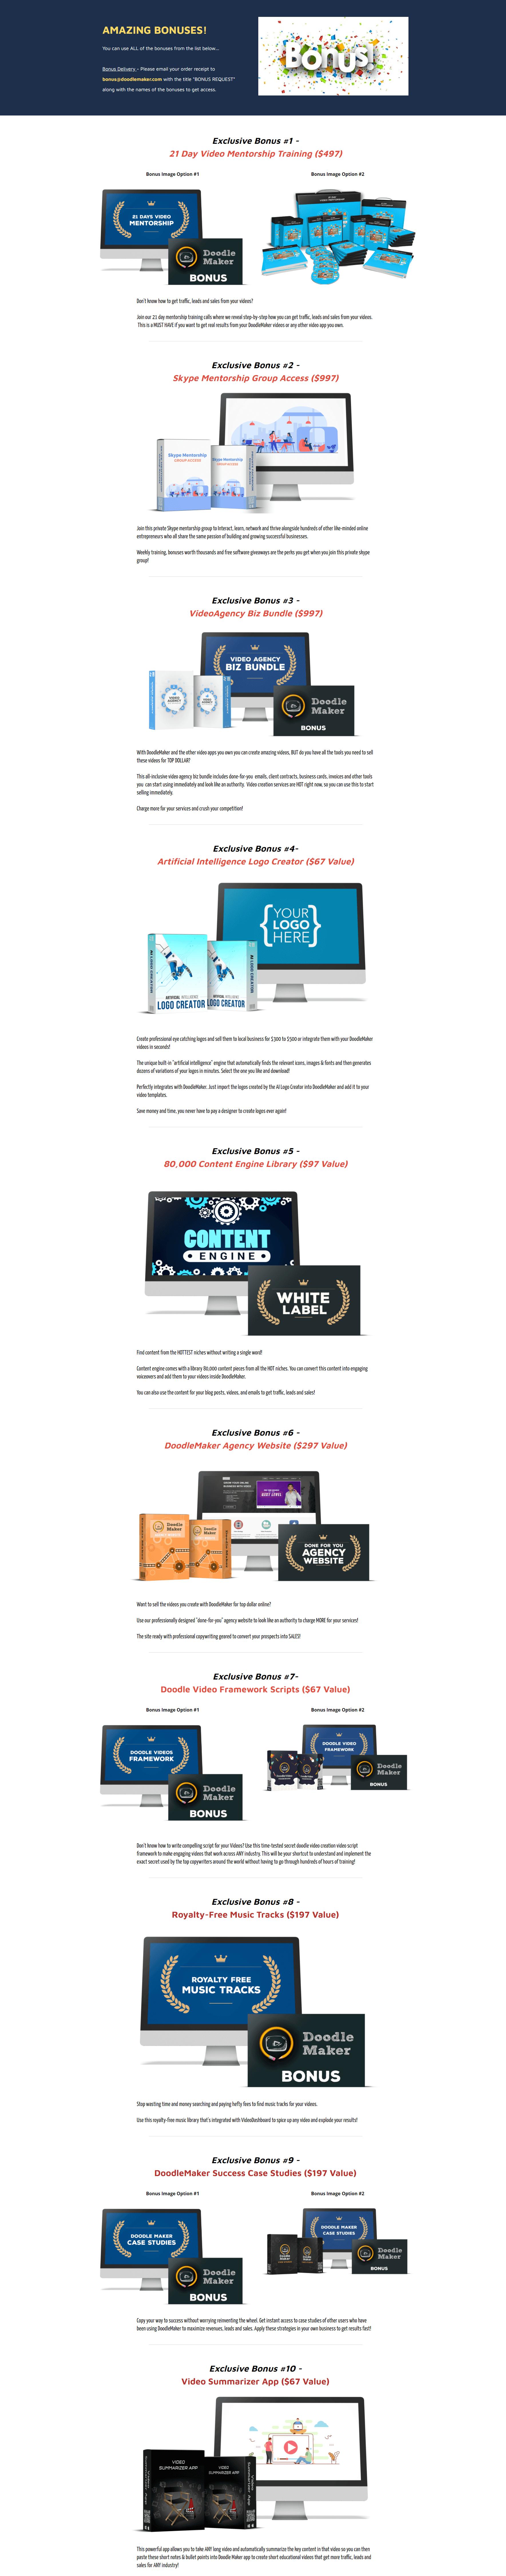 DoodleMaker-Review-Bonuses